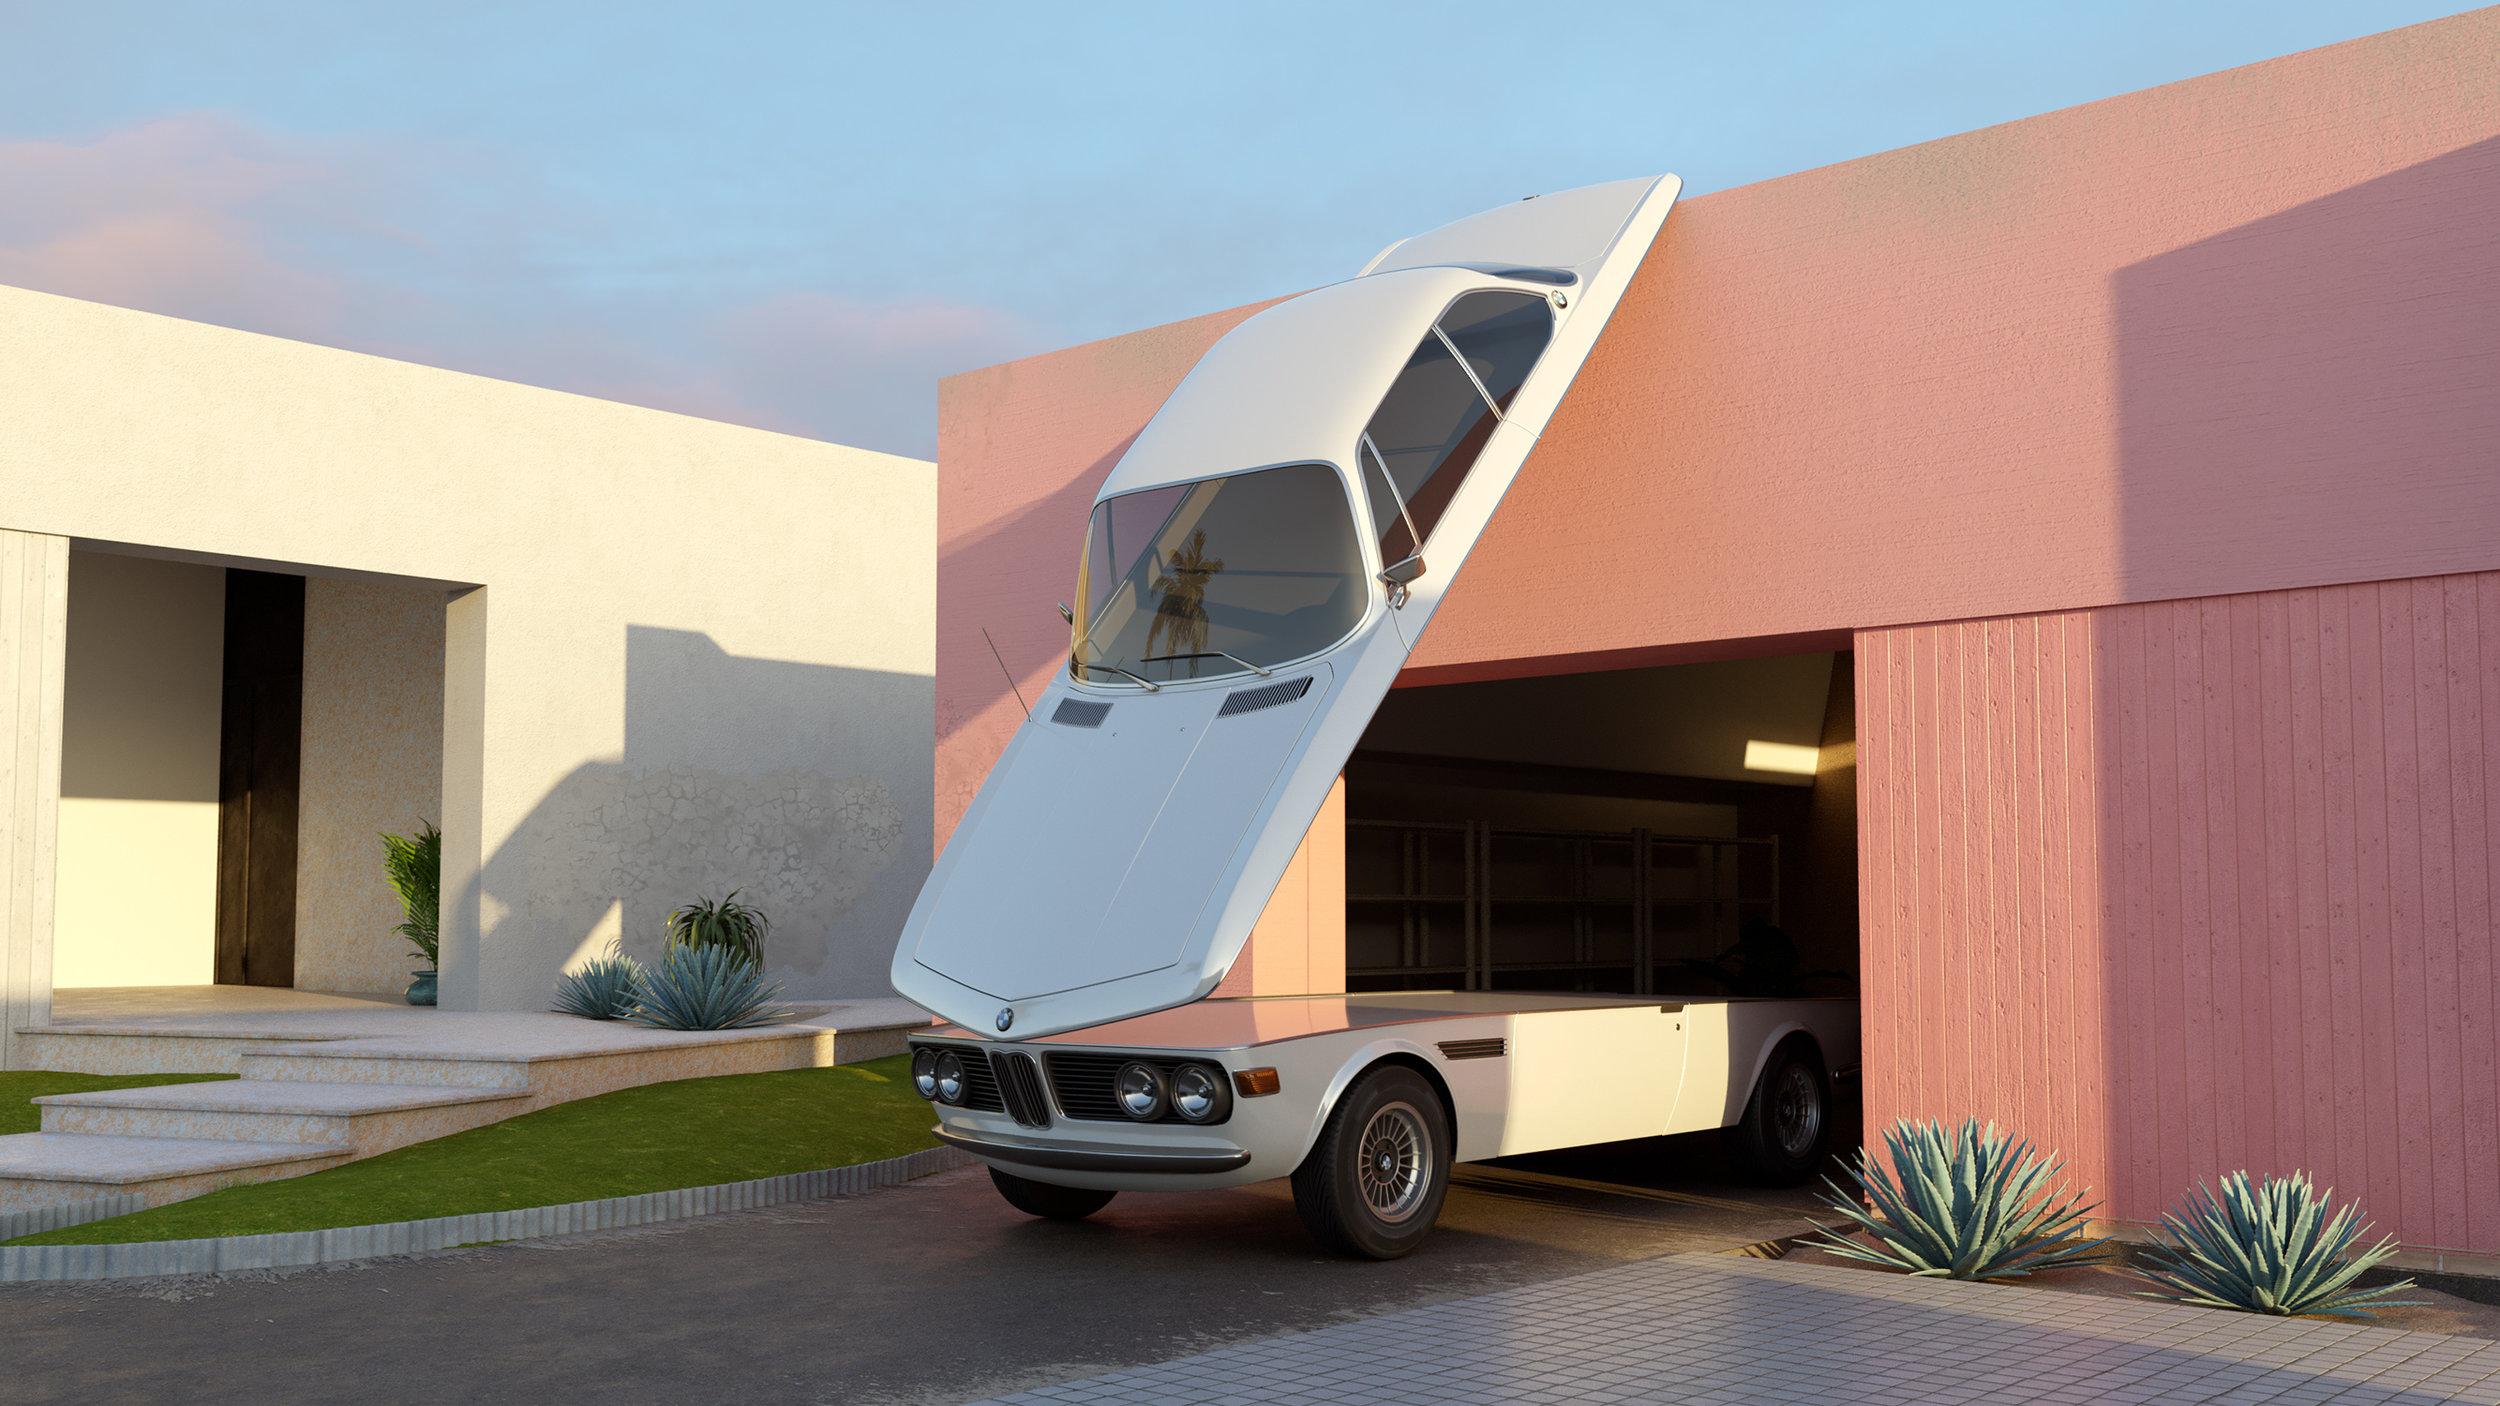 BMW_csl_3.0.jpg